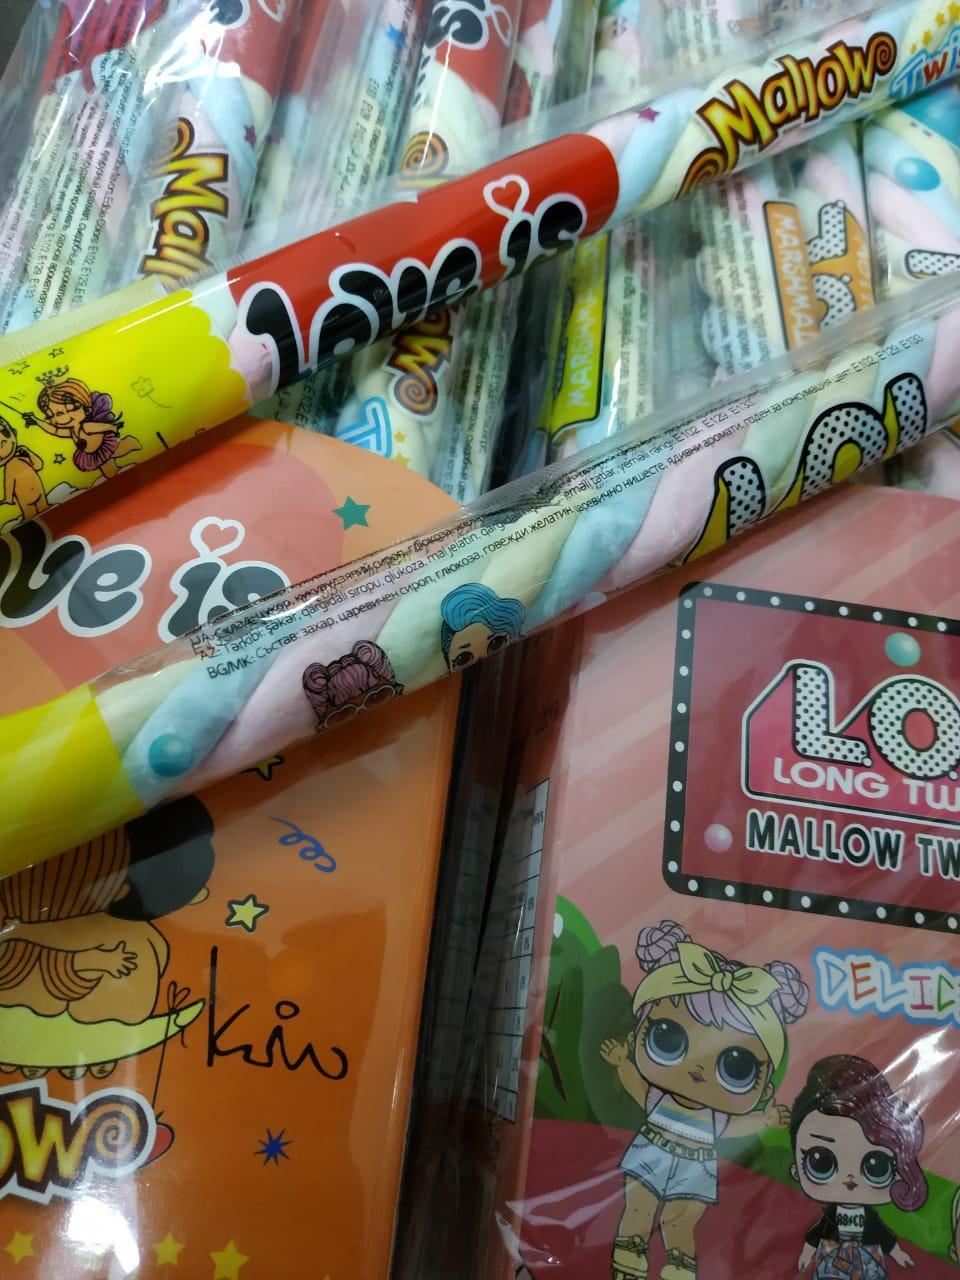 Суфле Косичка разноцветная Mallow Love is, LOL 18 гр.